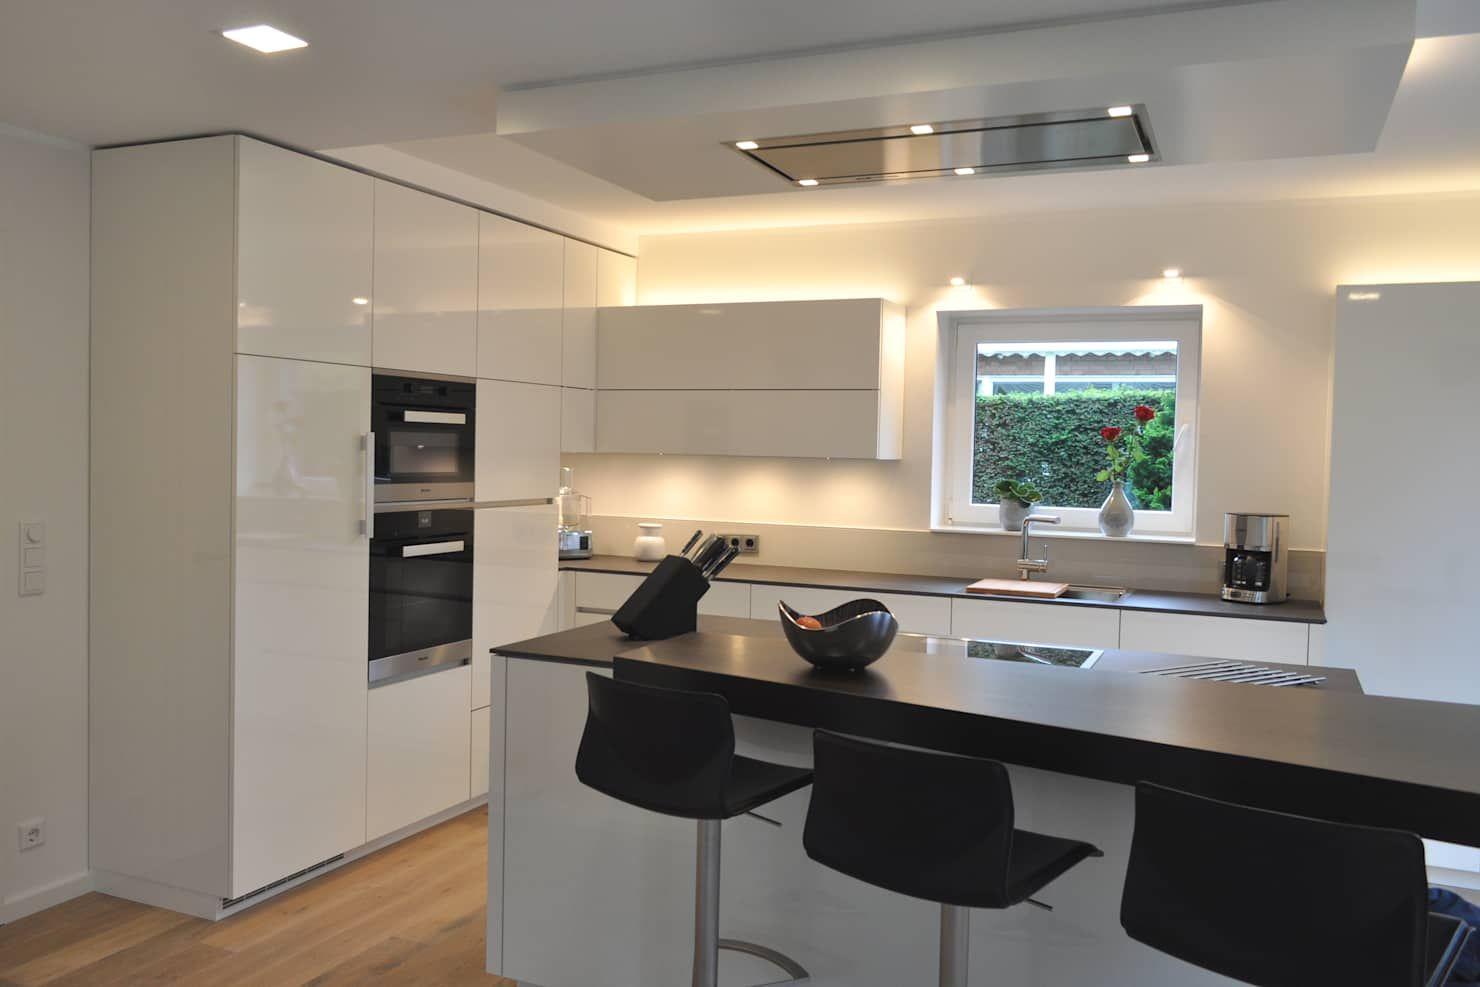 Plafoniere Moderne Di Design : Cucina in stile moderno di klocke möbelwerkstätte gmbh